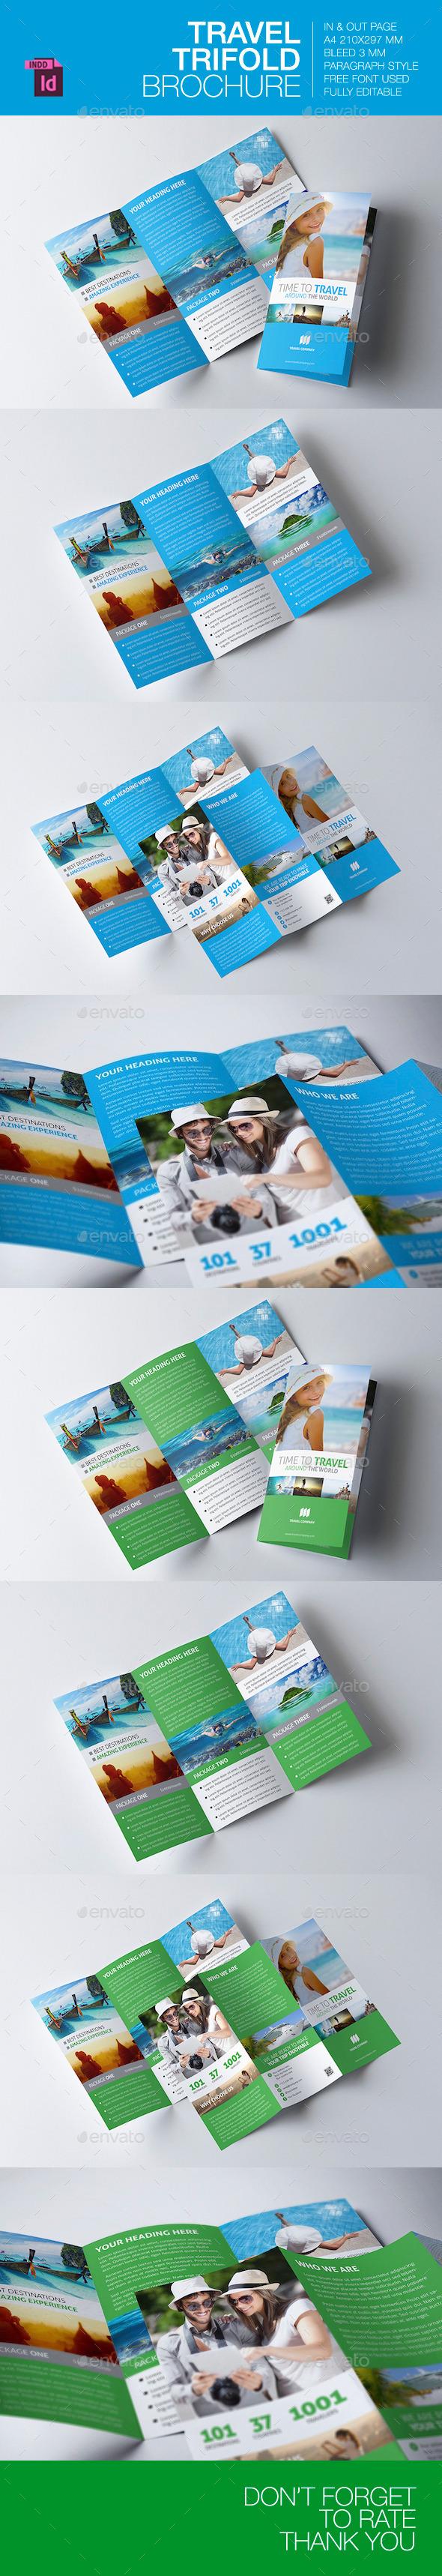 Travel Trifold Brochure V.3 - Brochures Print Templates